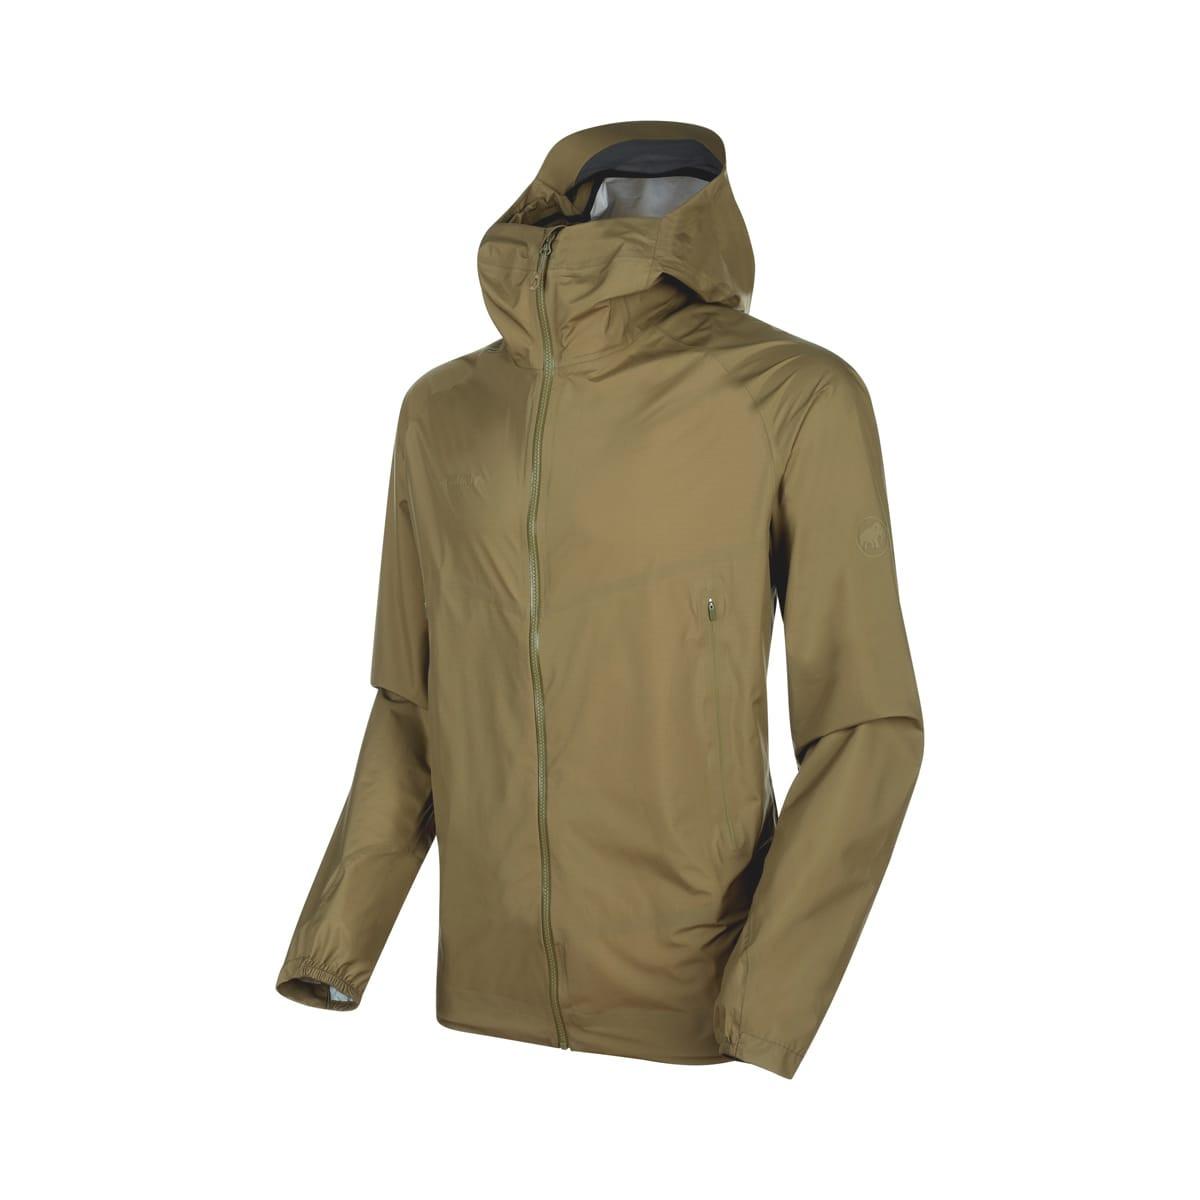 4445eb94 Mammut Masao Light HS Hooded Jacket Men Olive   Fjellsport.no